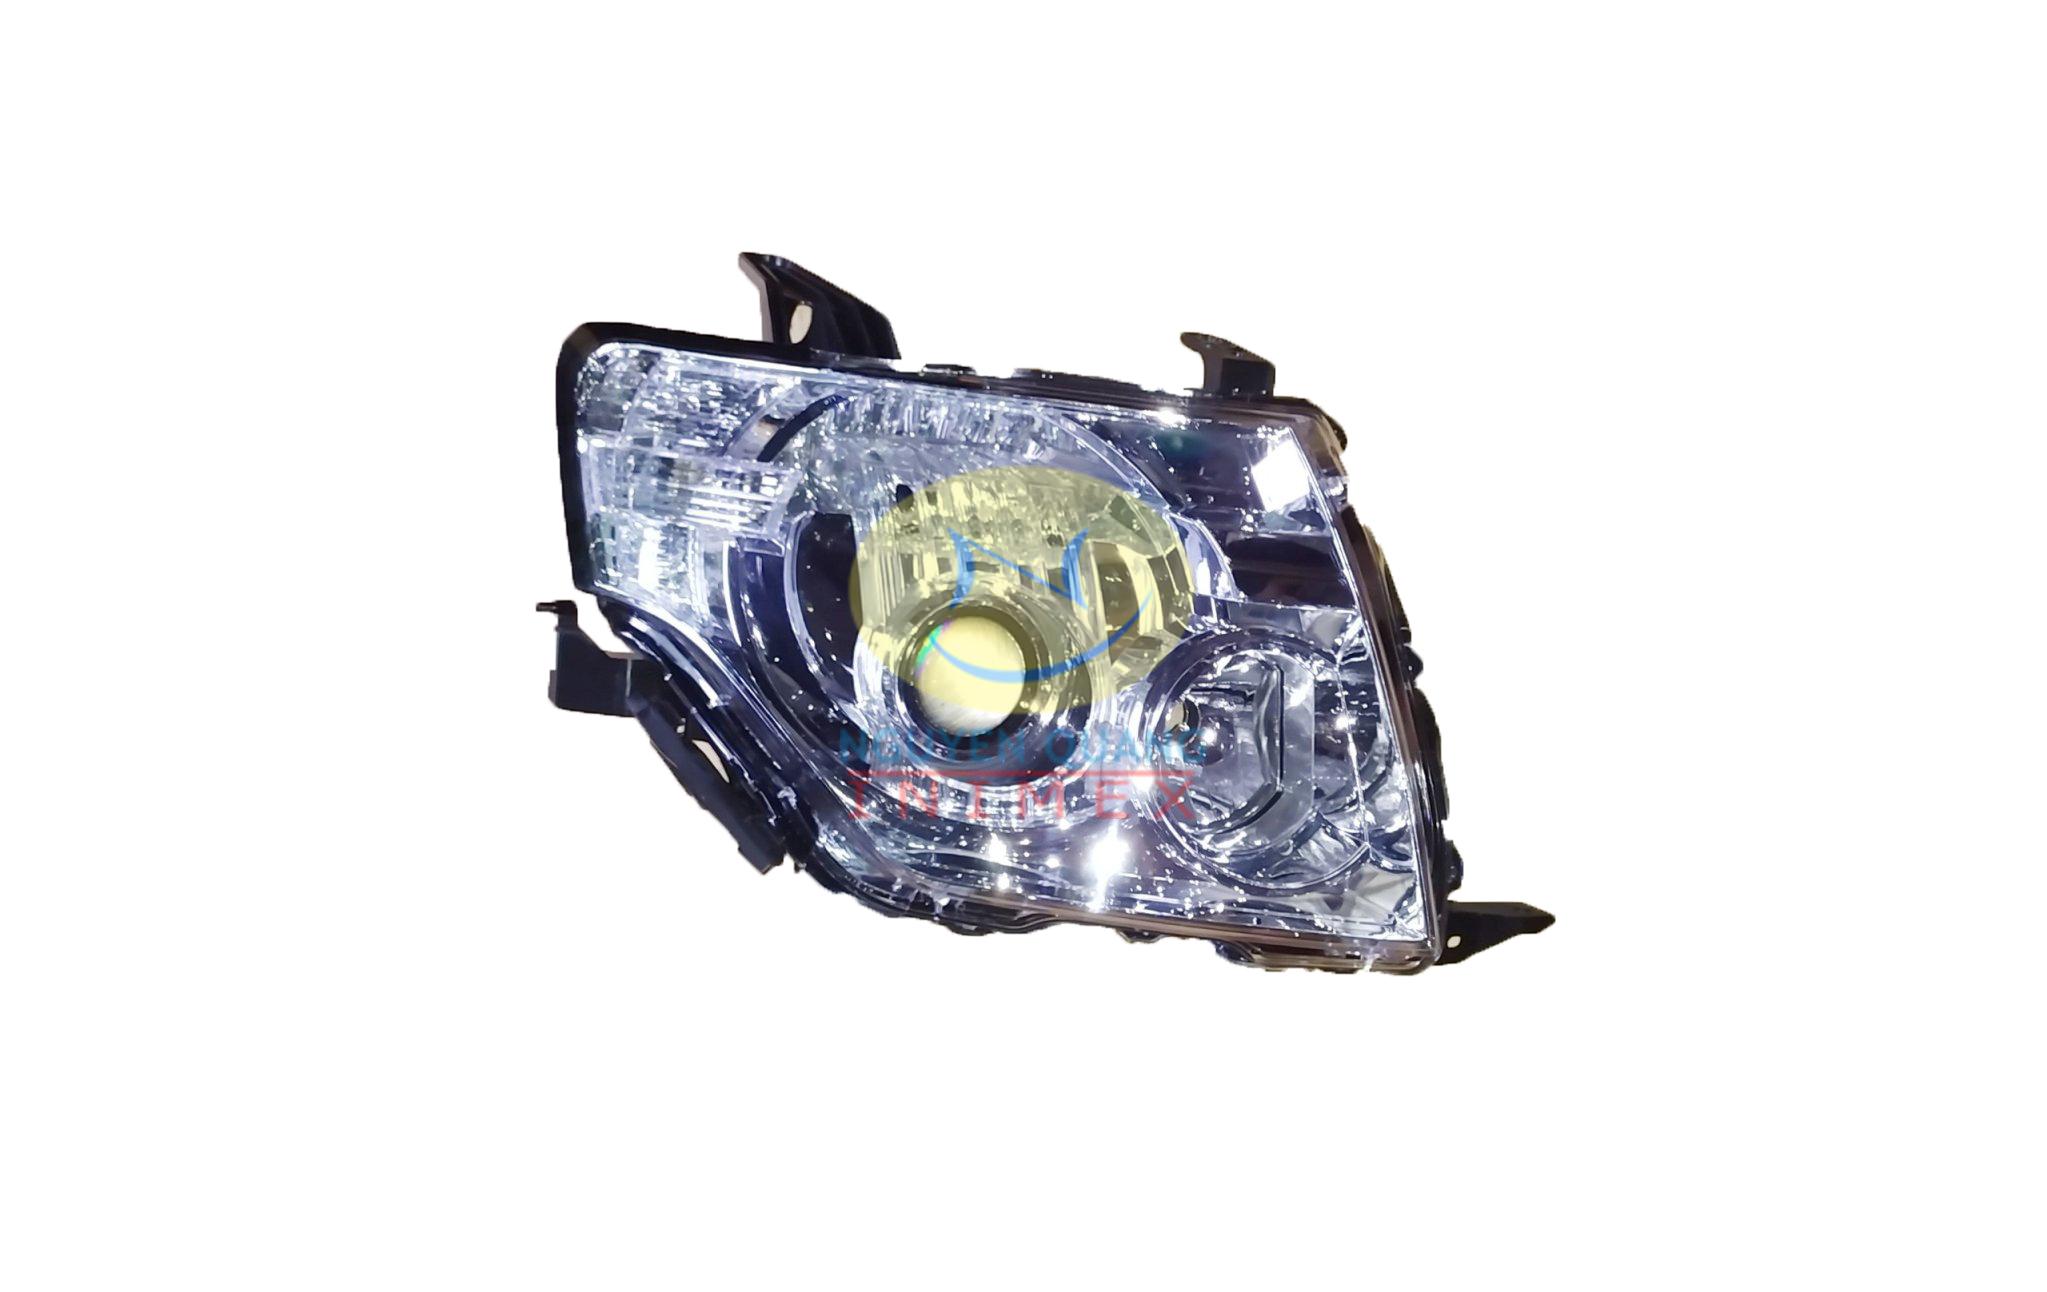 Đèn Pha Mitsubishi Pajero V93